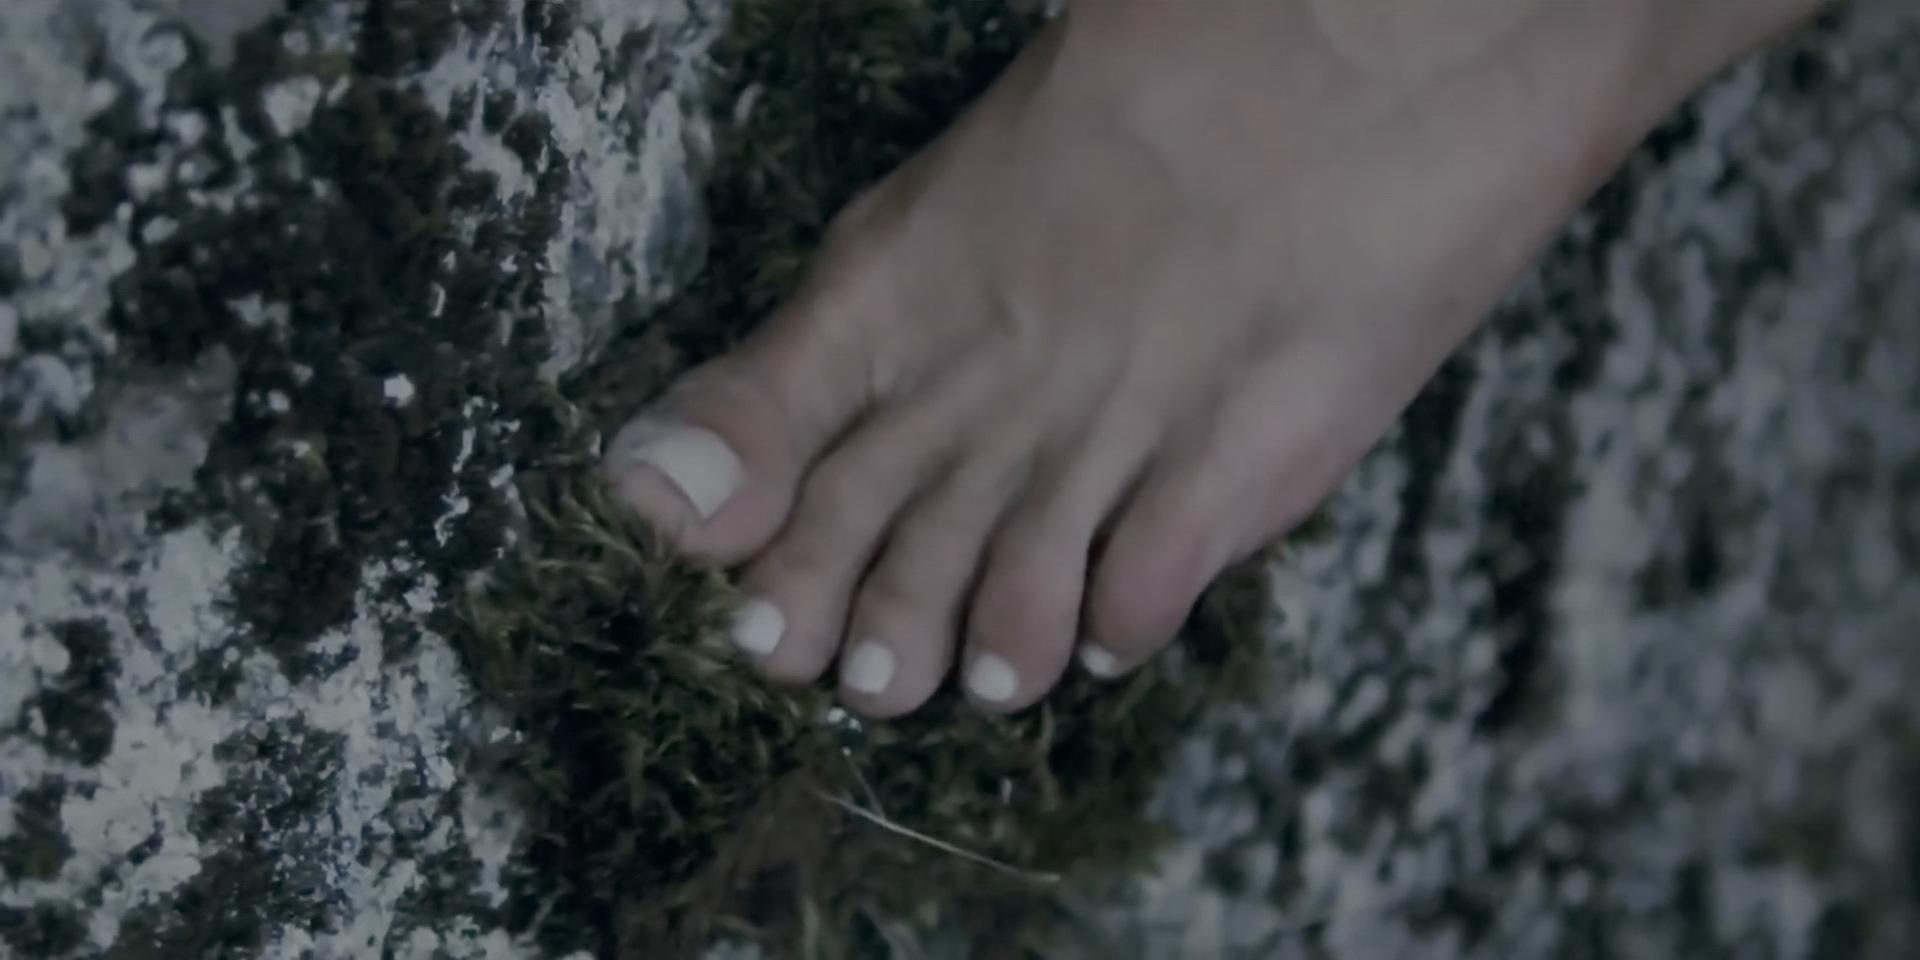 Feet Natalie Andreeva nude photos 2019